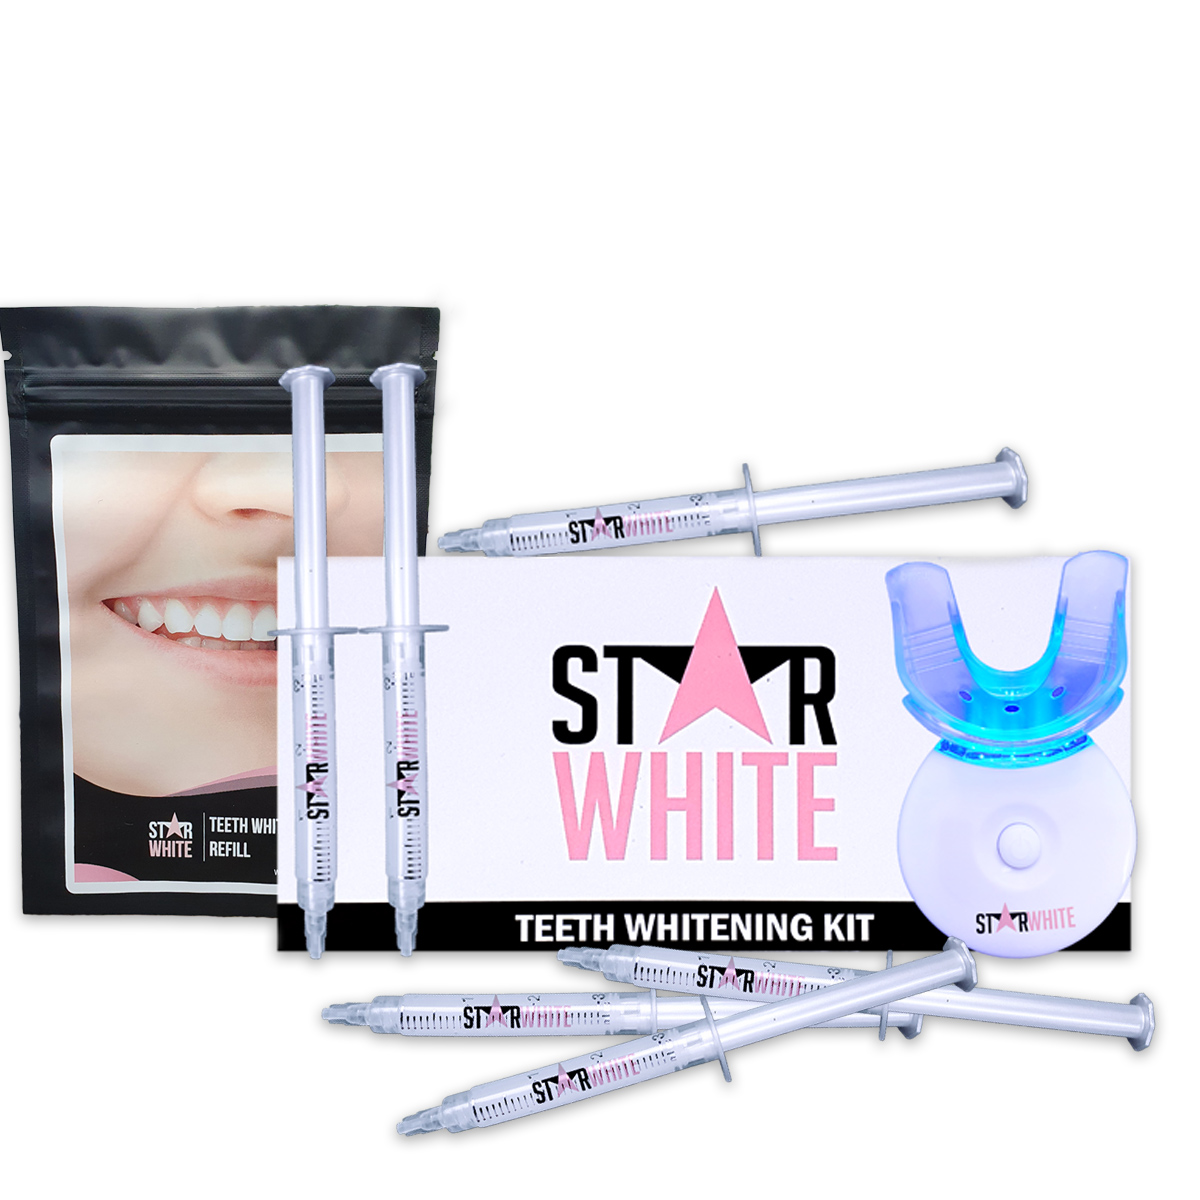 Teeth Whitening Kit & Refill